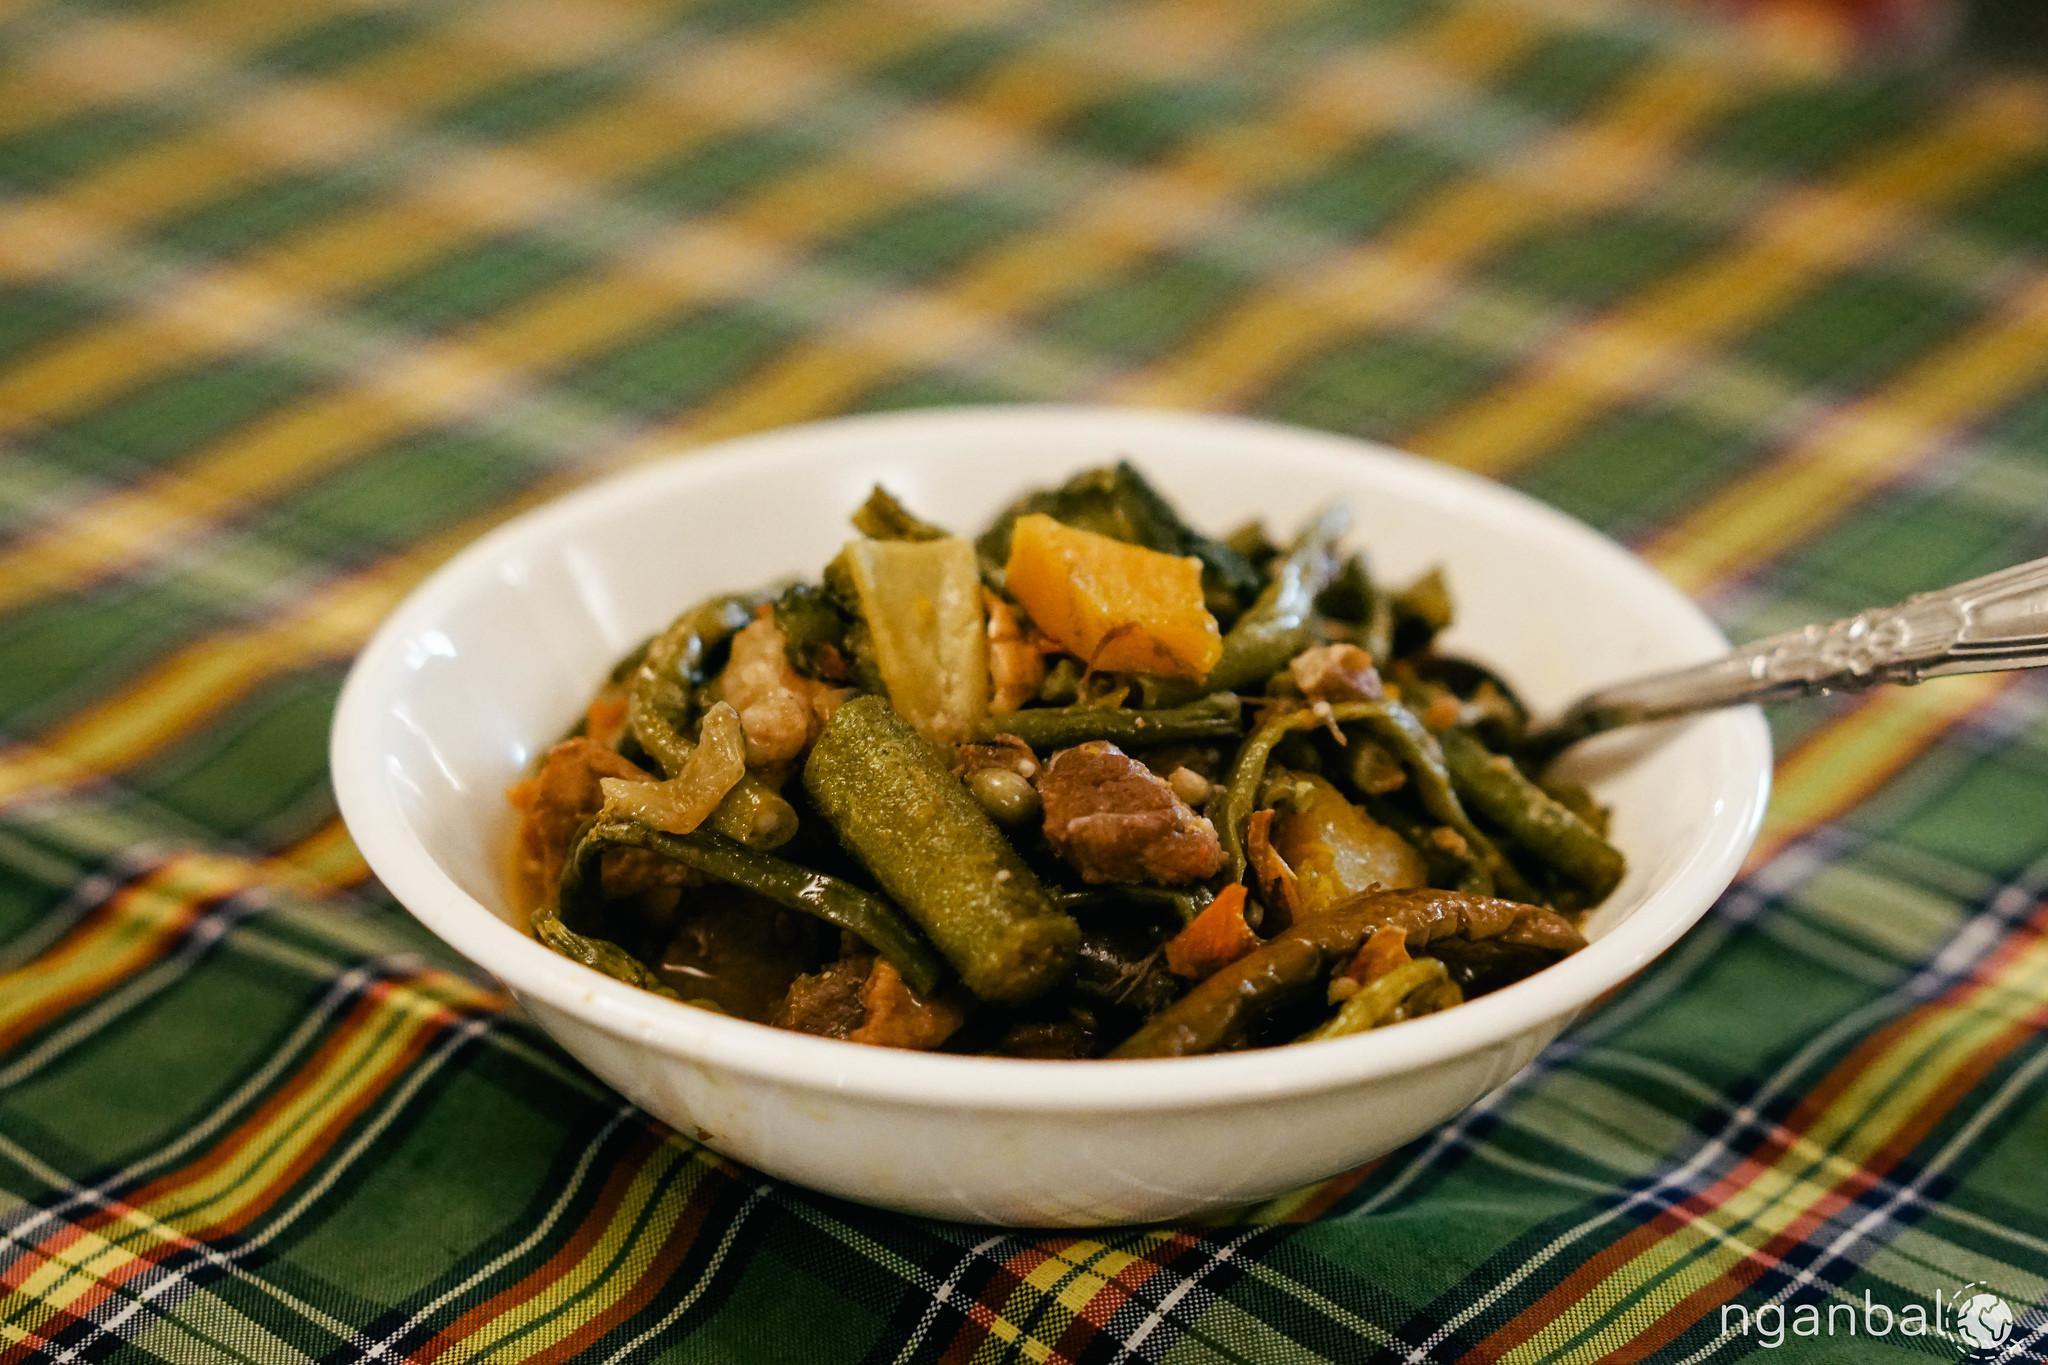 du lịch Manila: ẩm thực